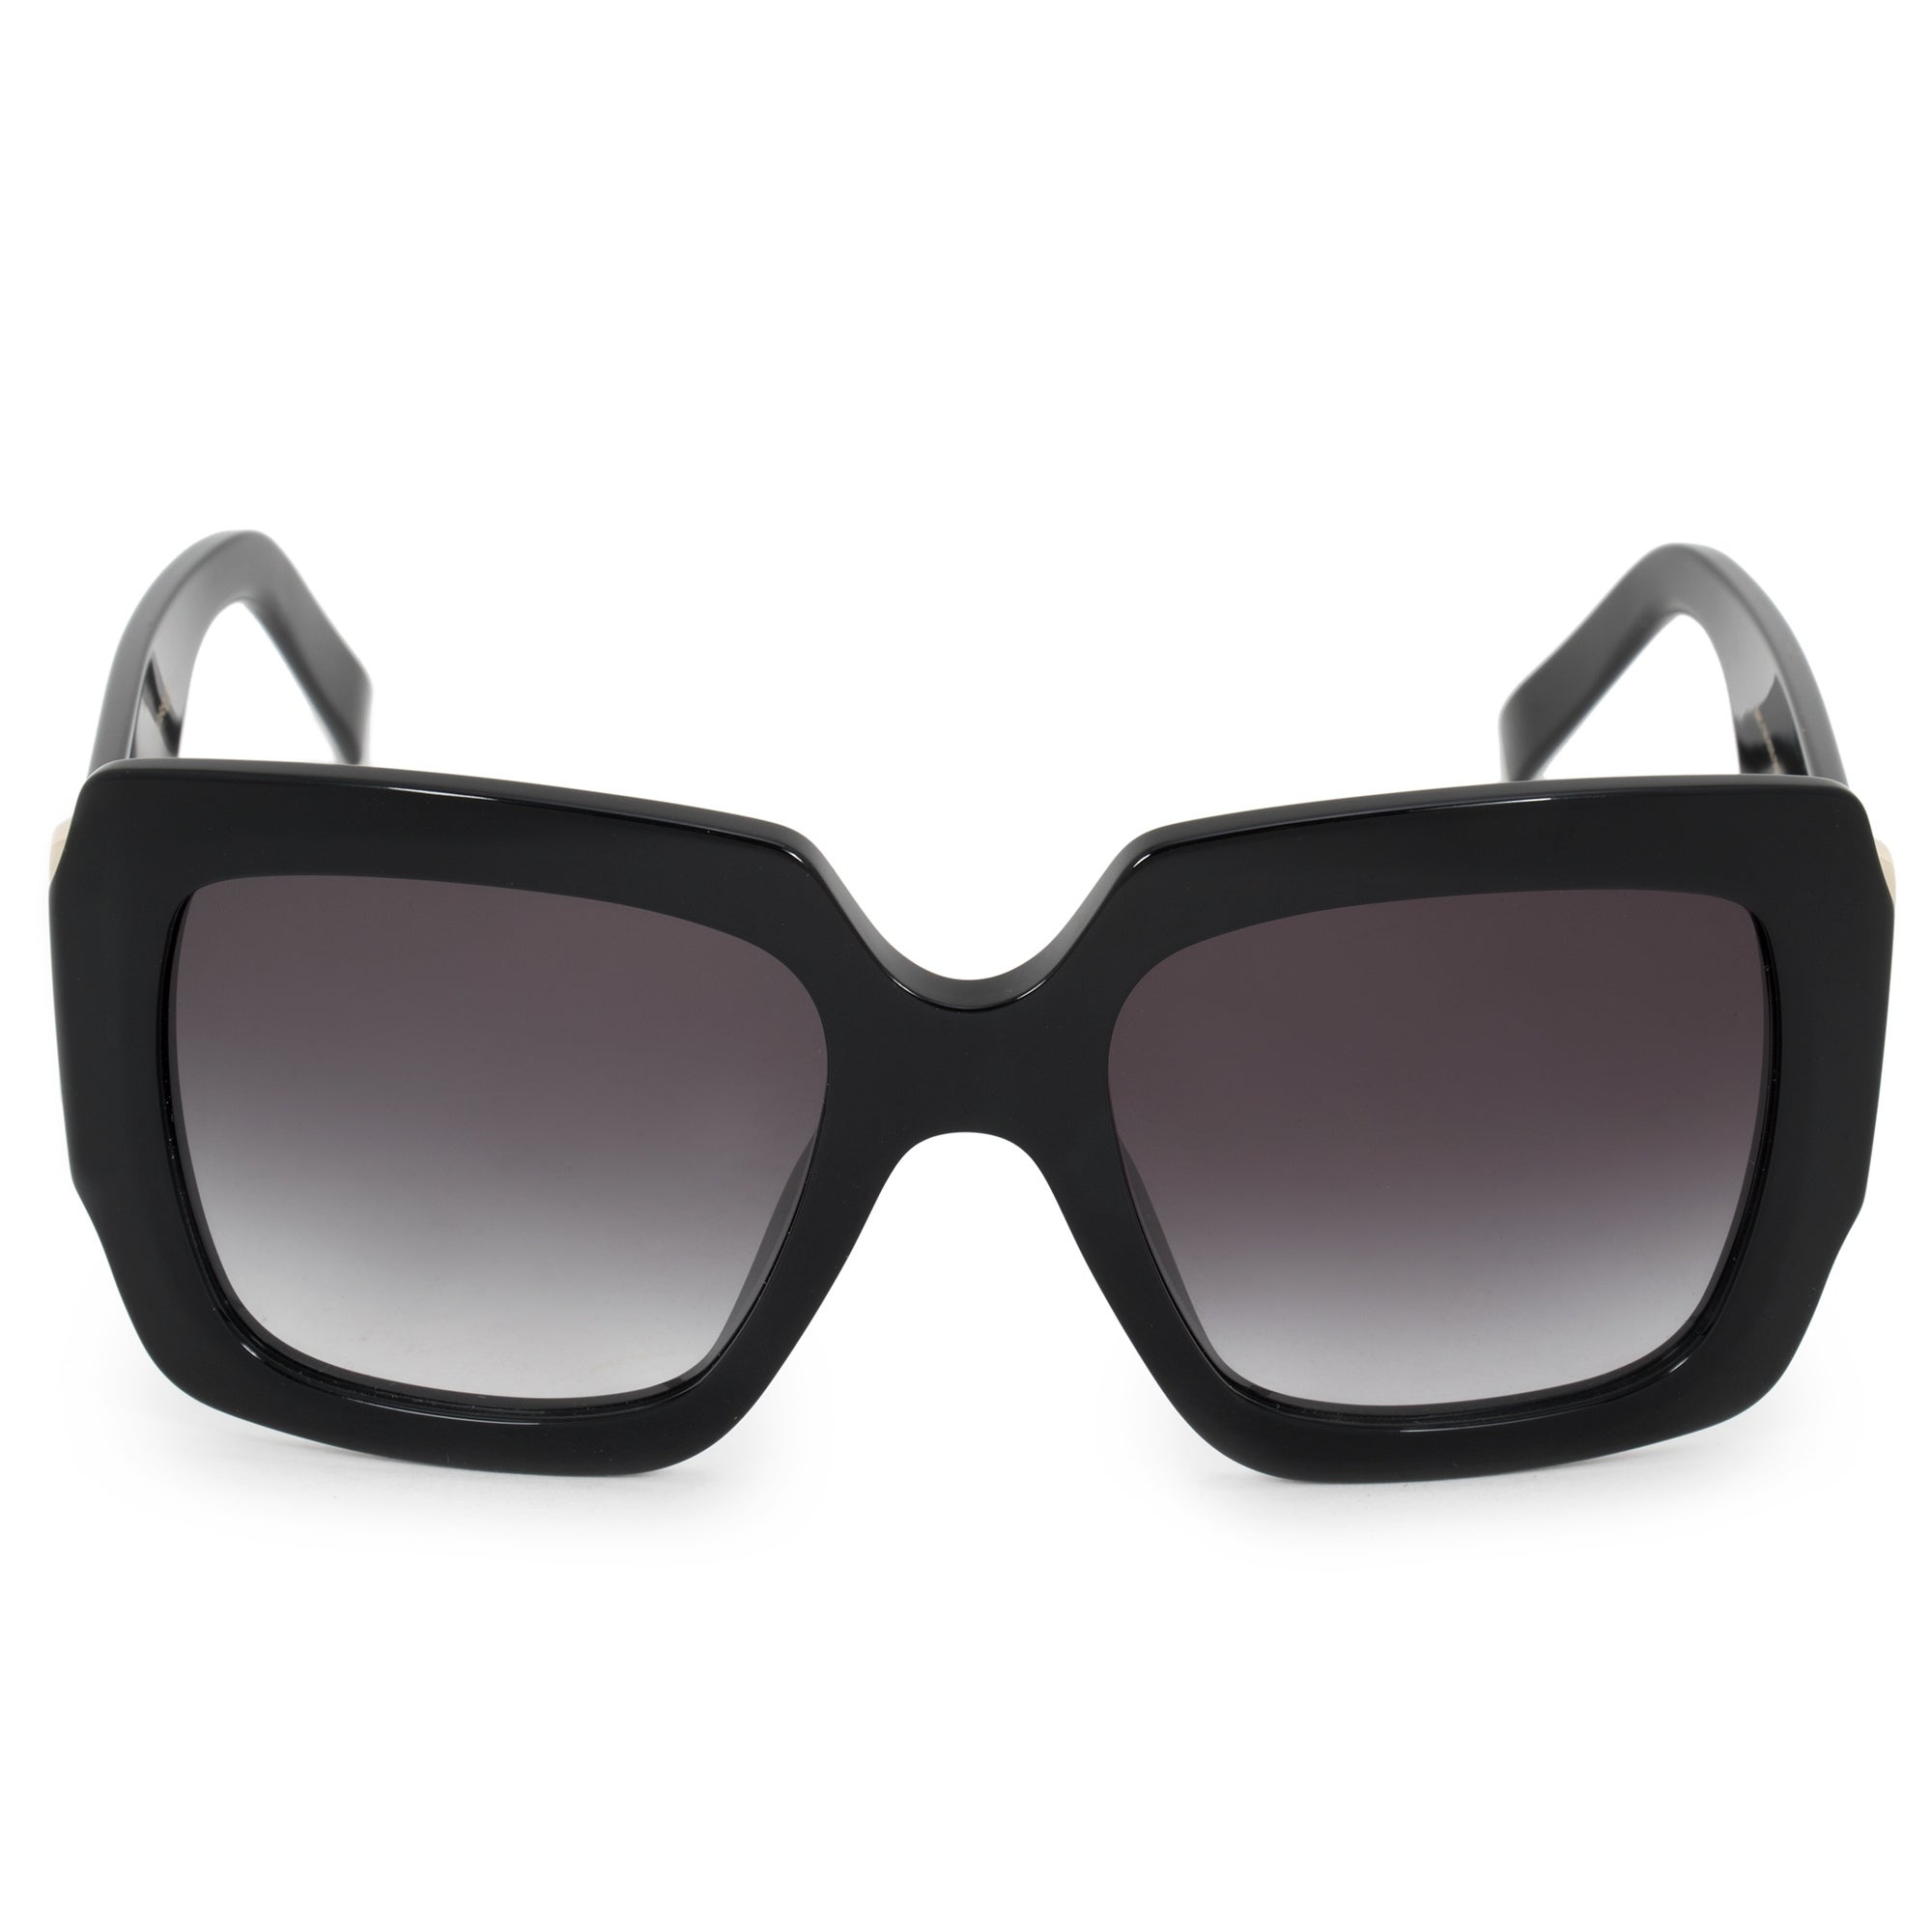 132a862583398 Shop Marc Jacobs Square Sunglasses MJ179S 807 9O 53 - Free Shipping ...